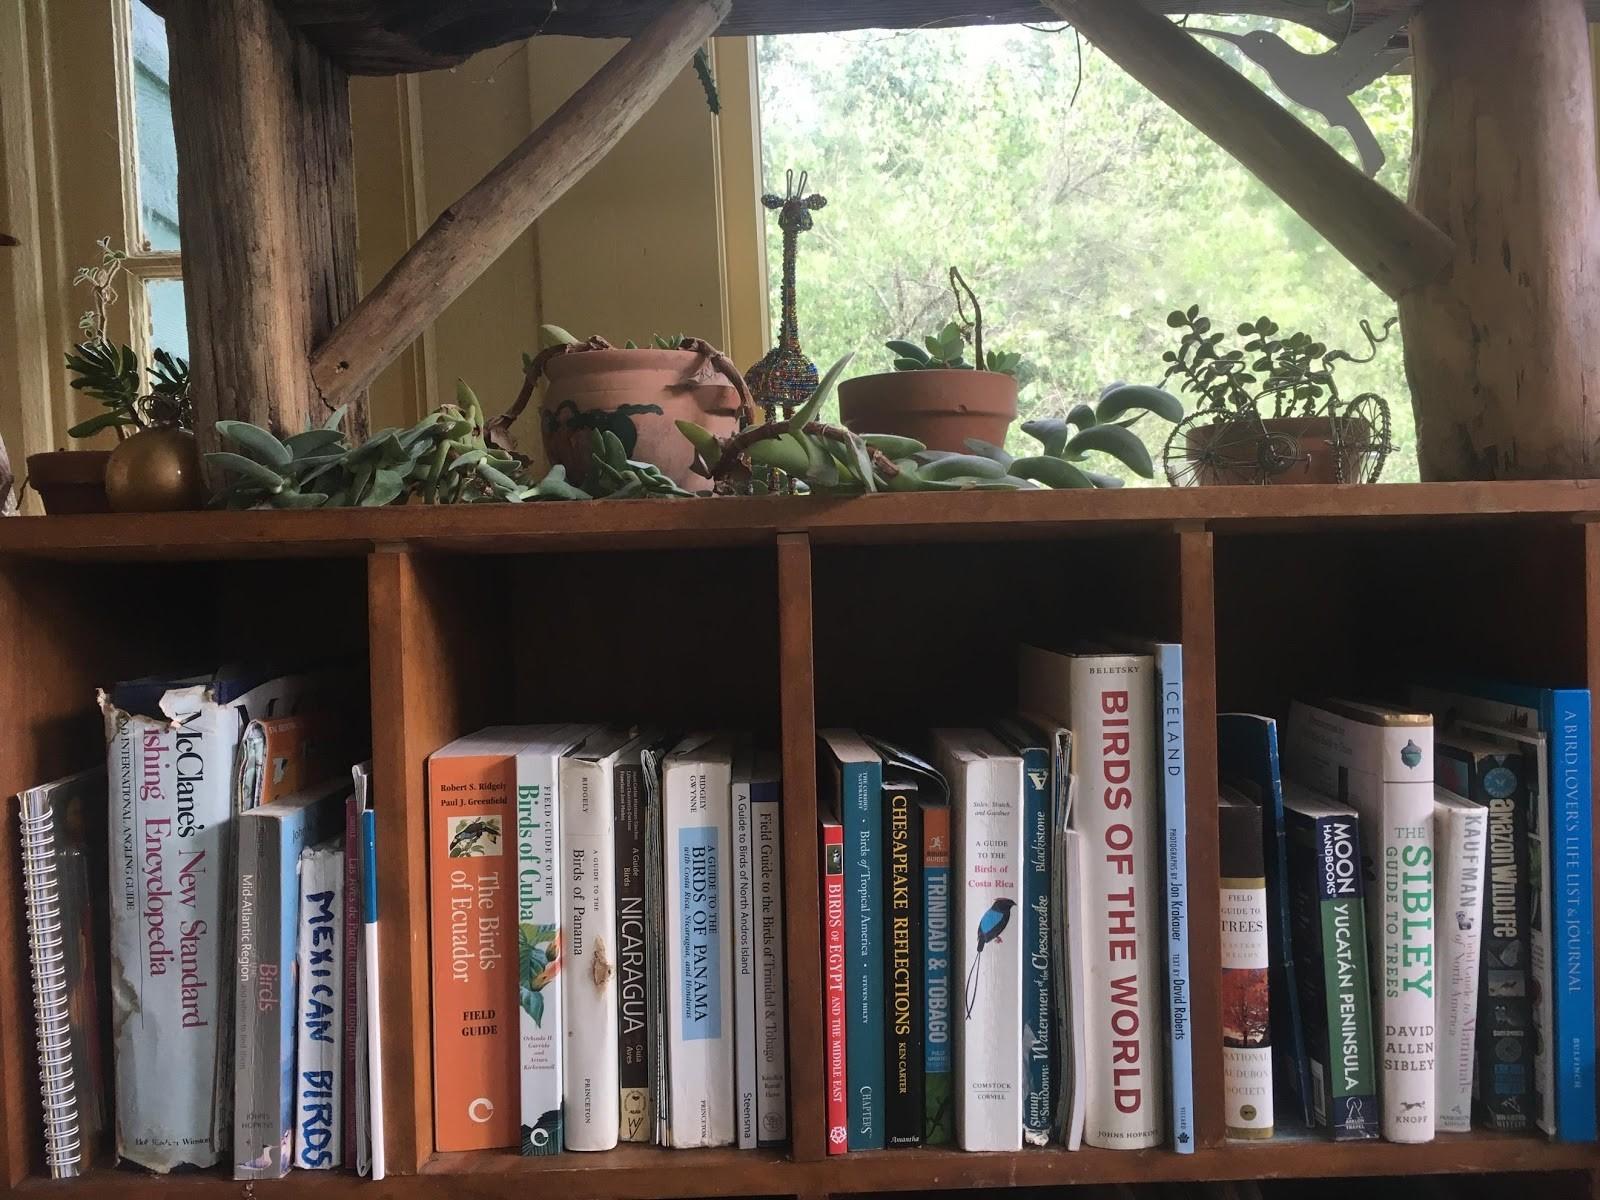 1. Entire bookshelf of bird field guides